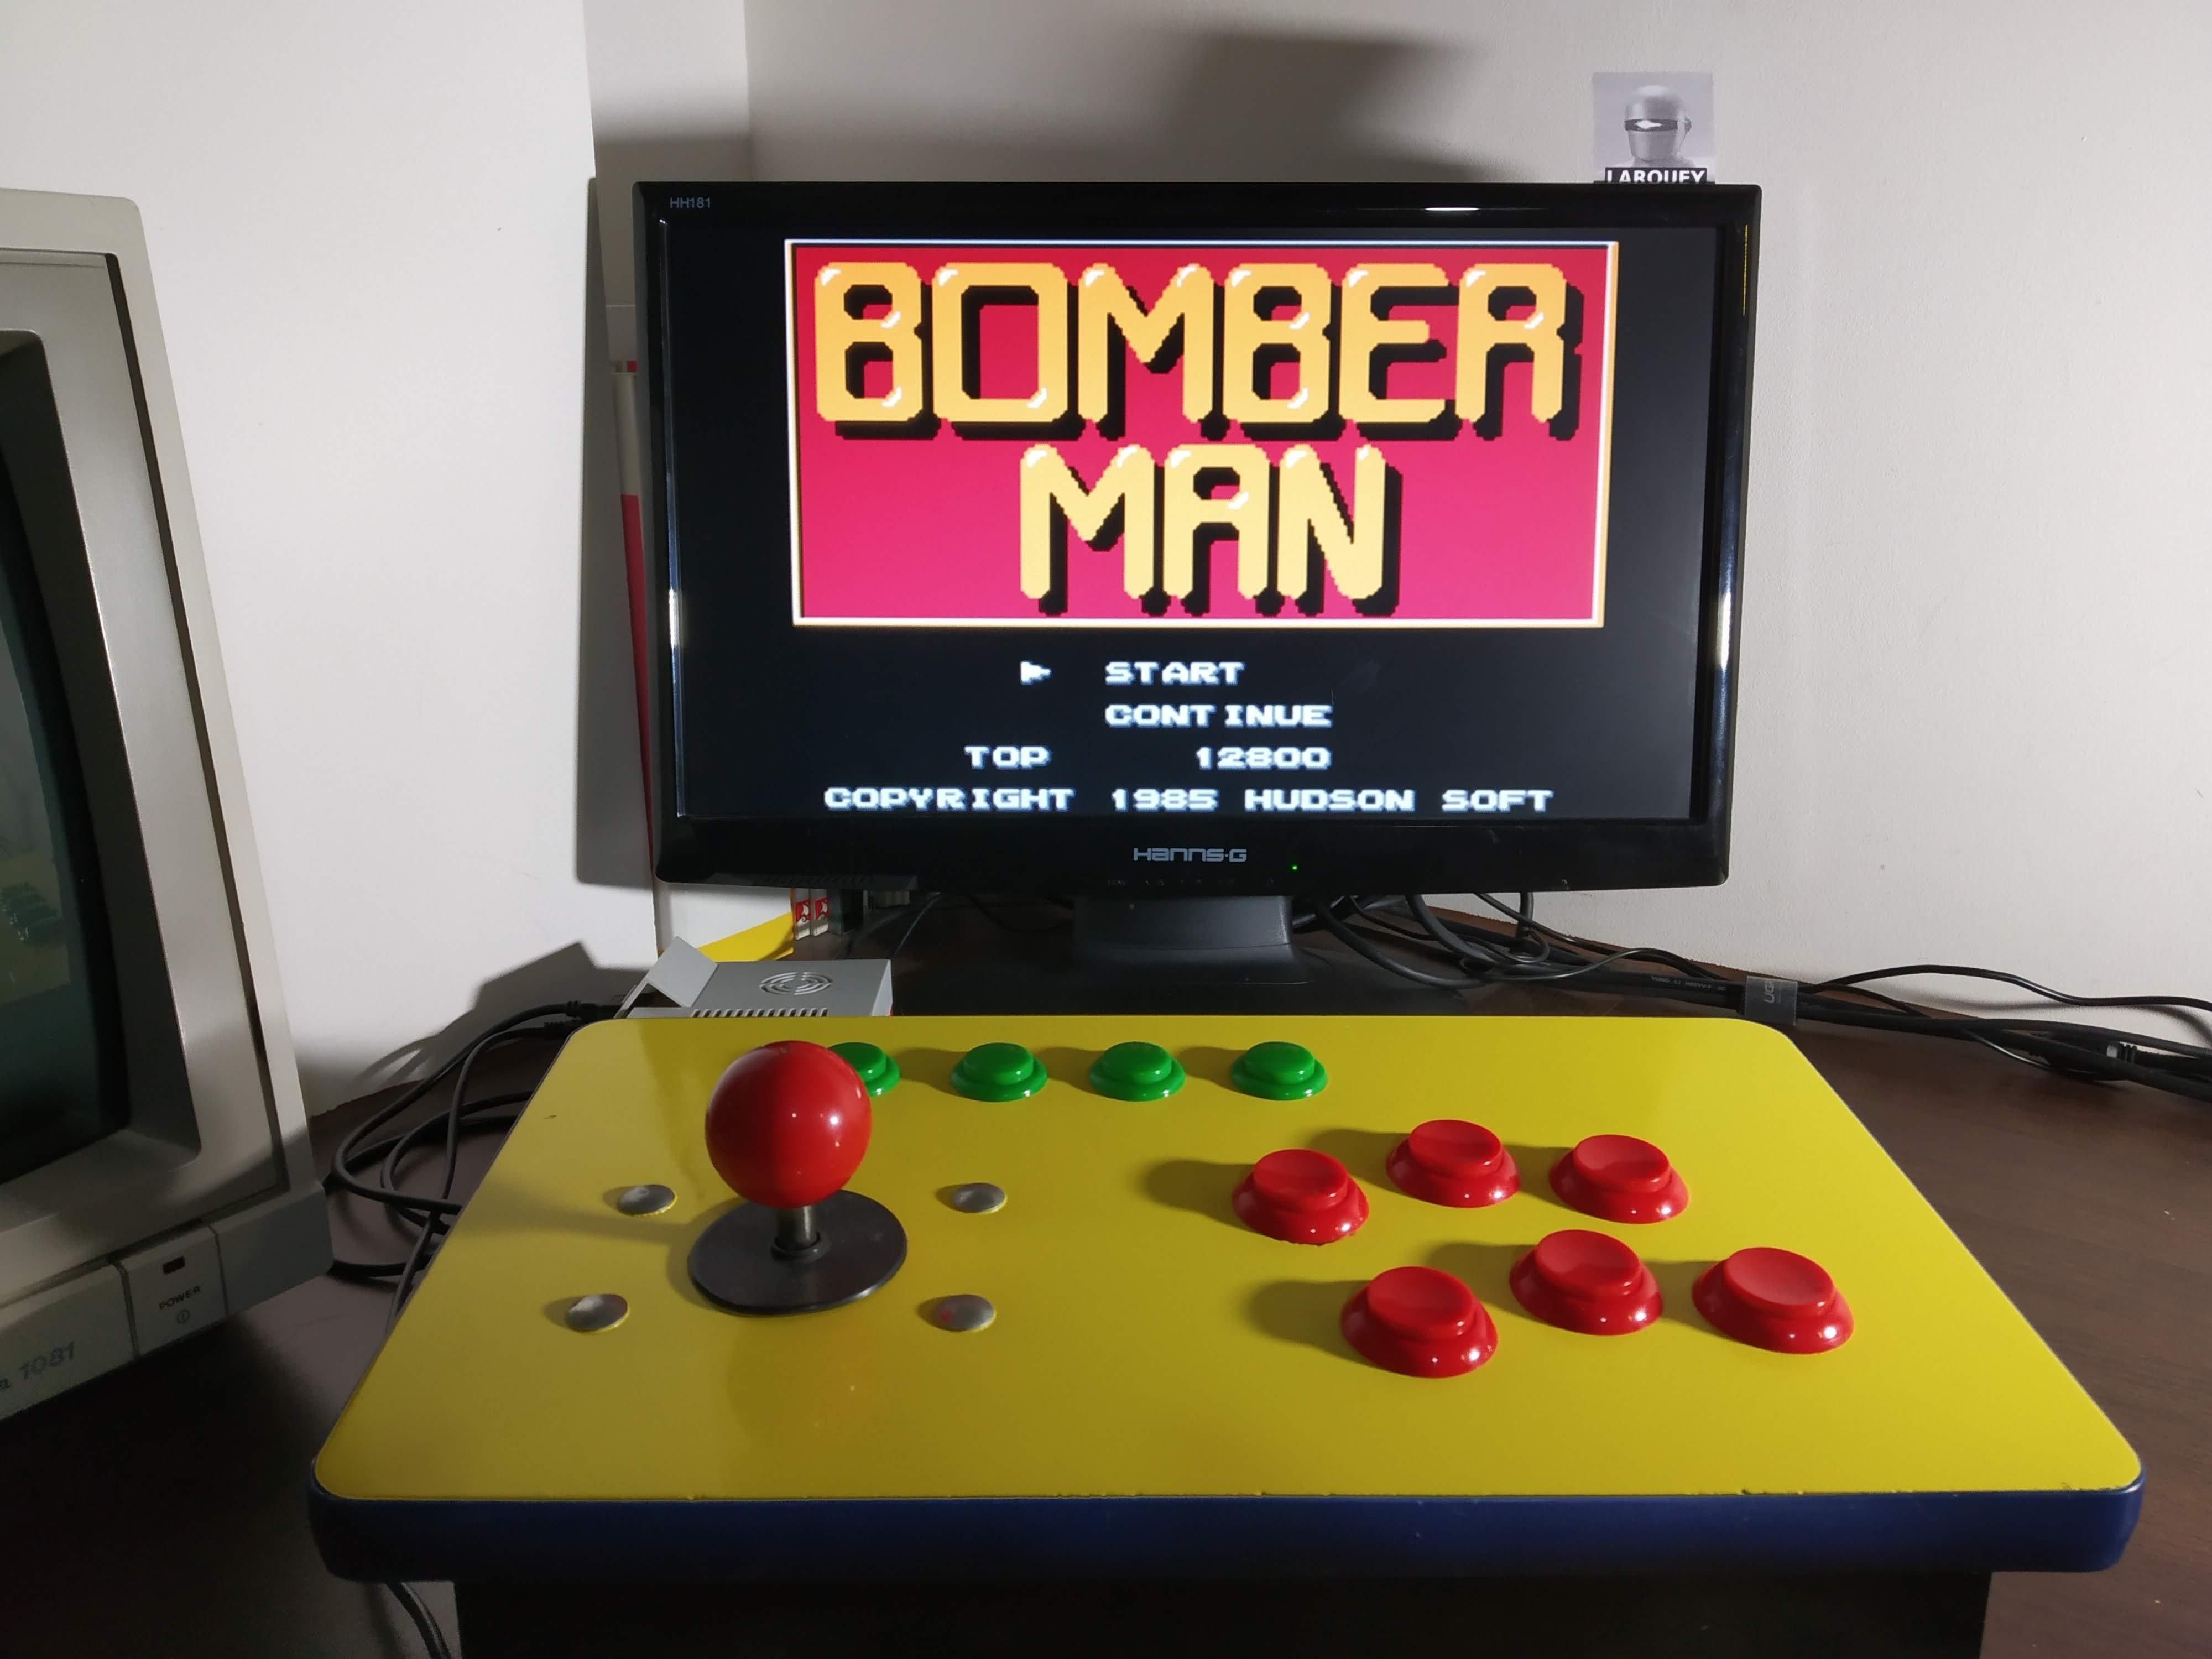 Larquey: Famicom Mini Vol. 9: Bomberman (GBA Emulated) 12,800 points on 2019-12-21 08:12:20